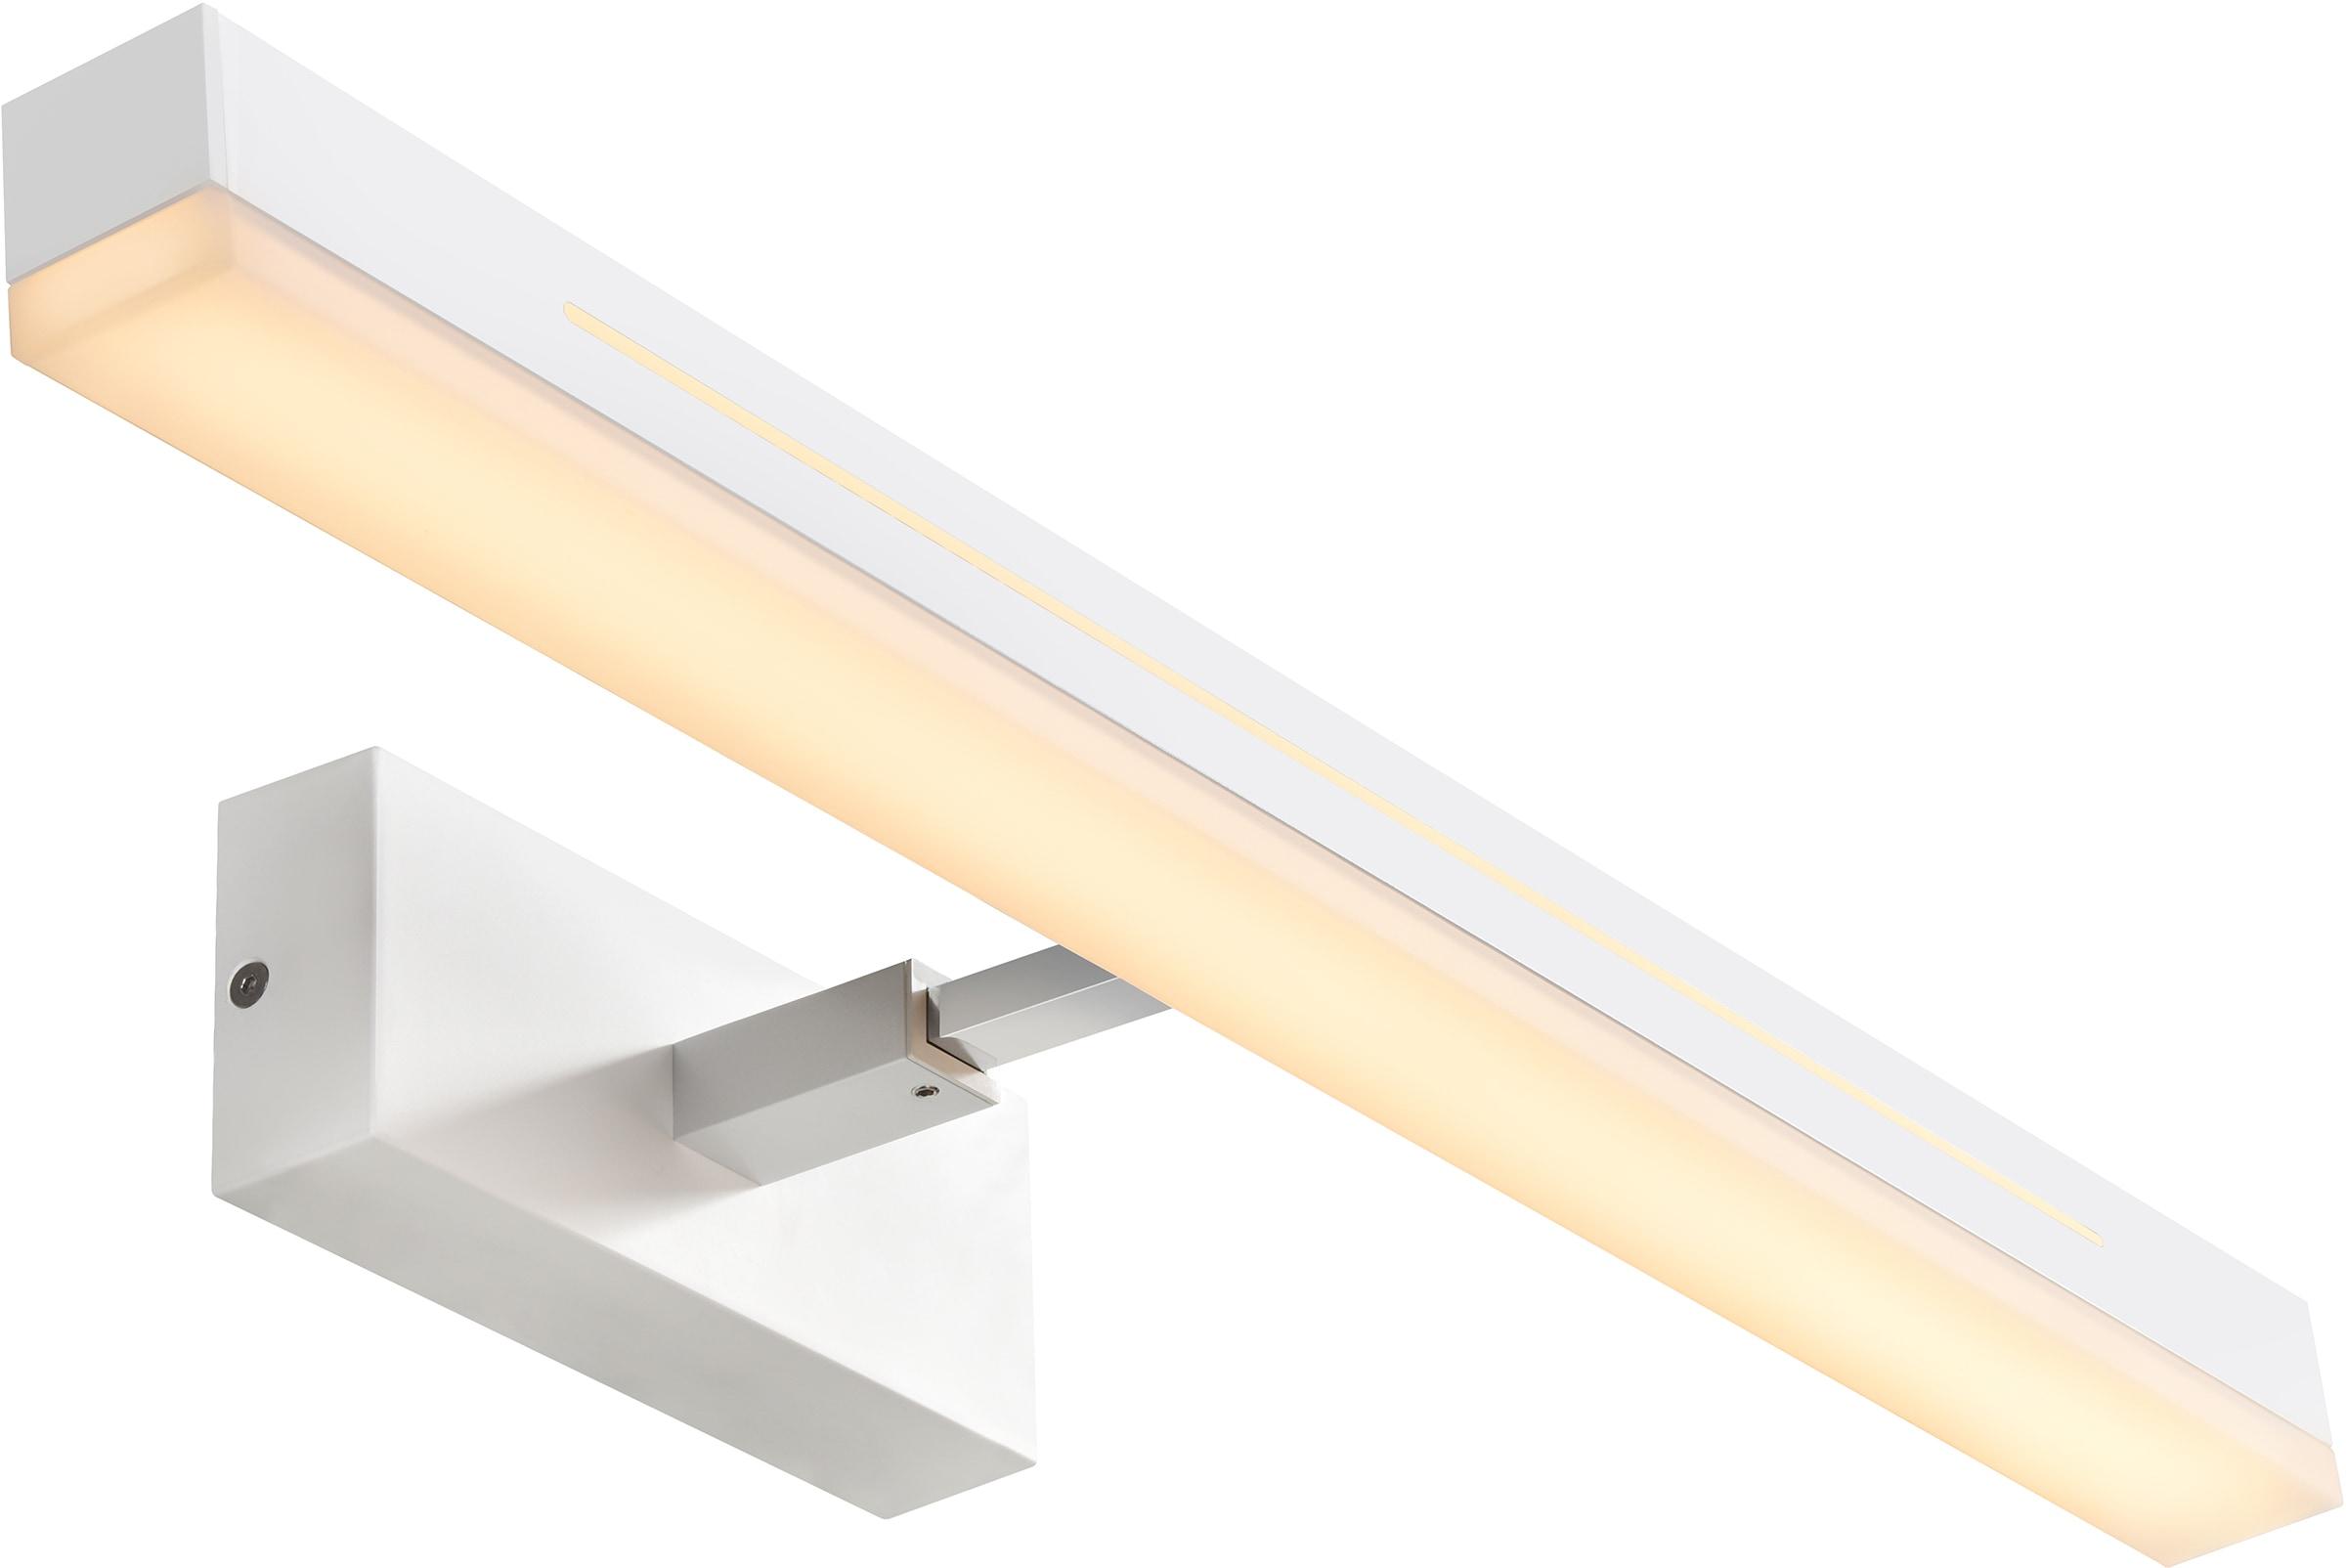 Nordlux LED Wandleuchte OTIS, LED-Modul, 5 Jahre Garantie auf die LED